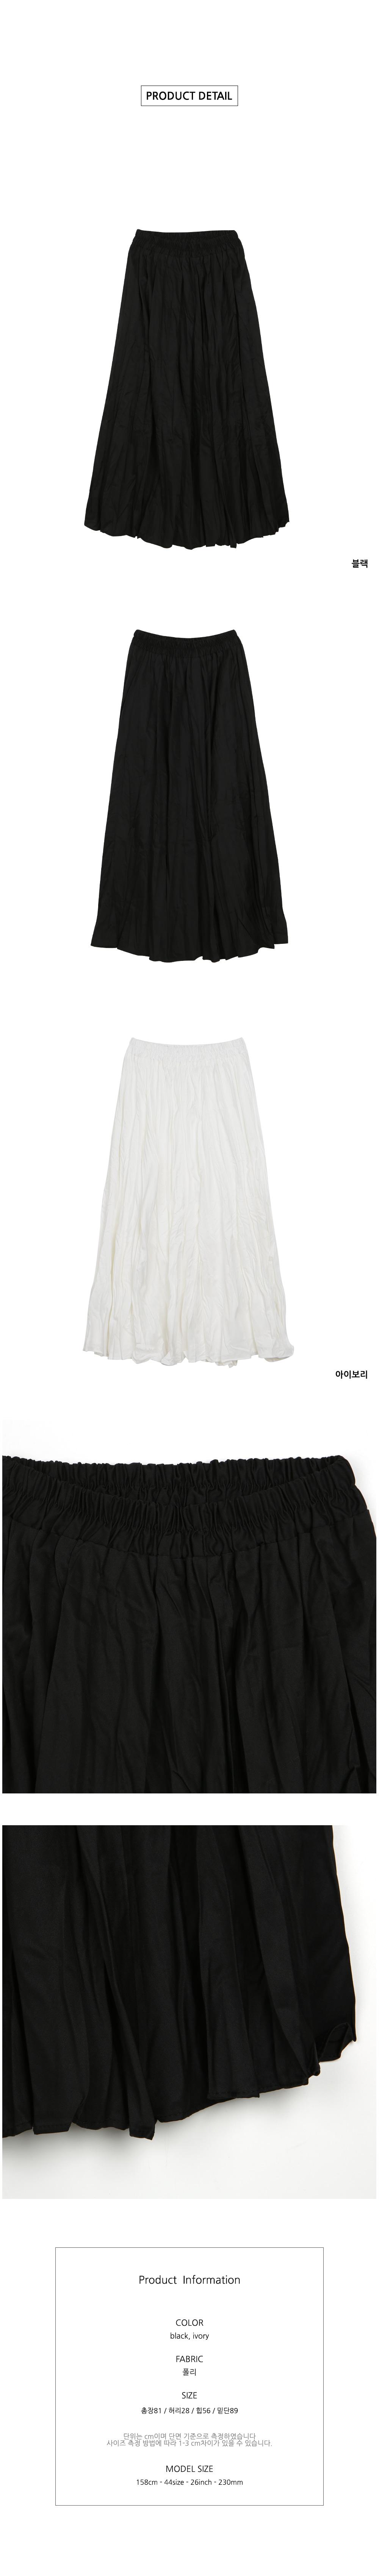 Wrinkle sky long skirt P#YW398